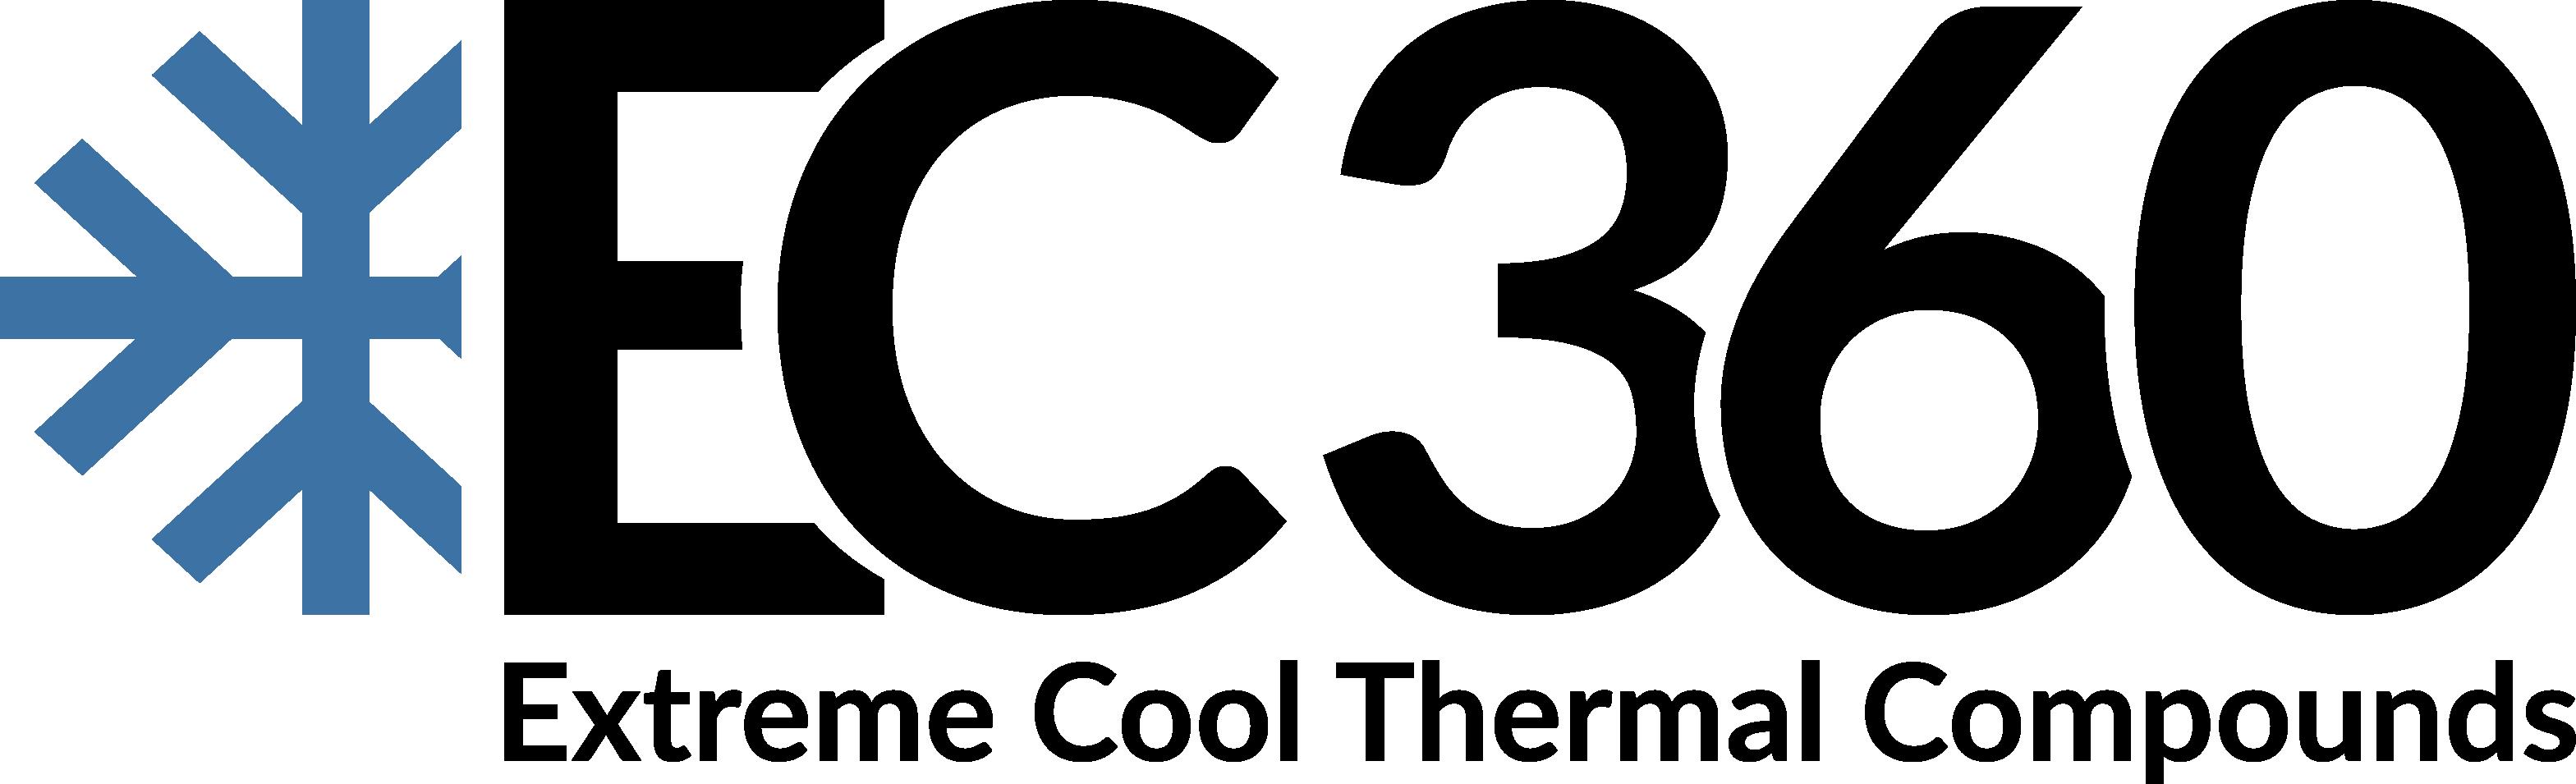 EC360